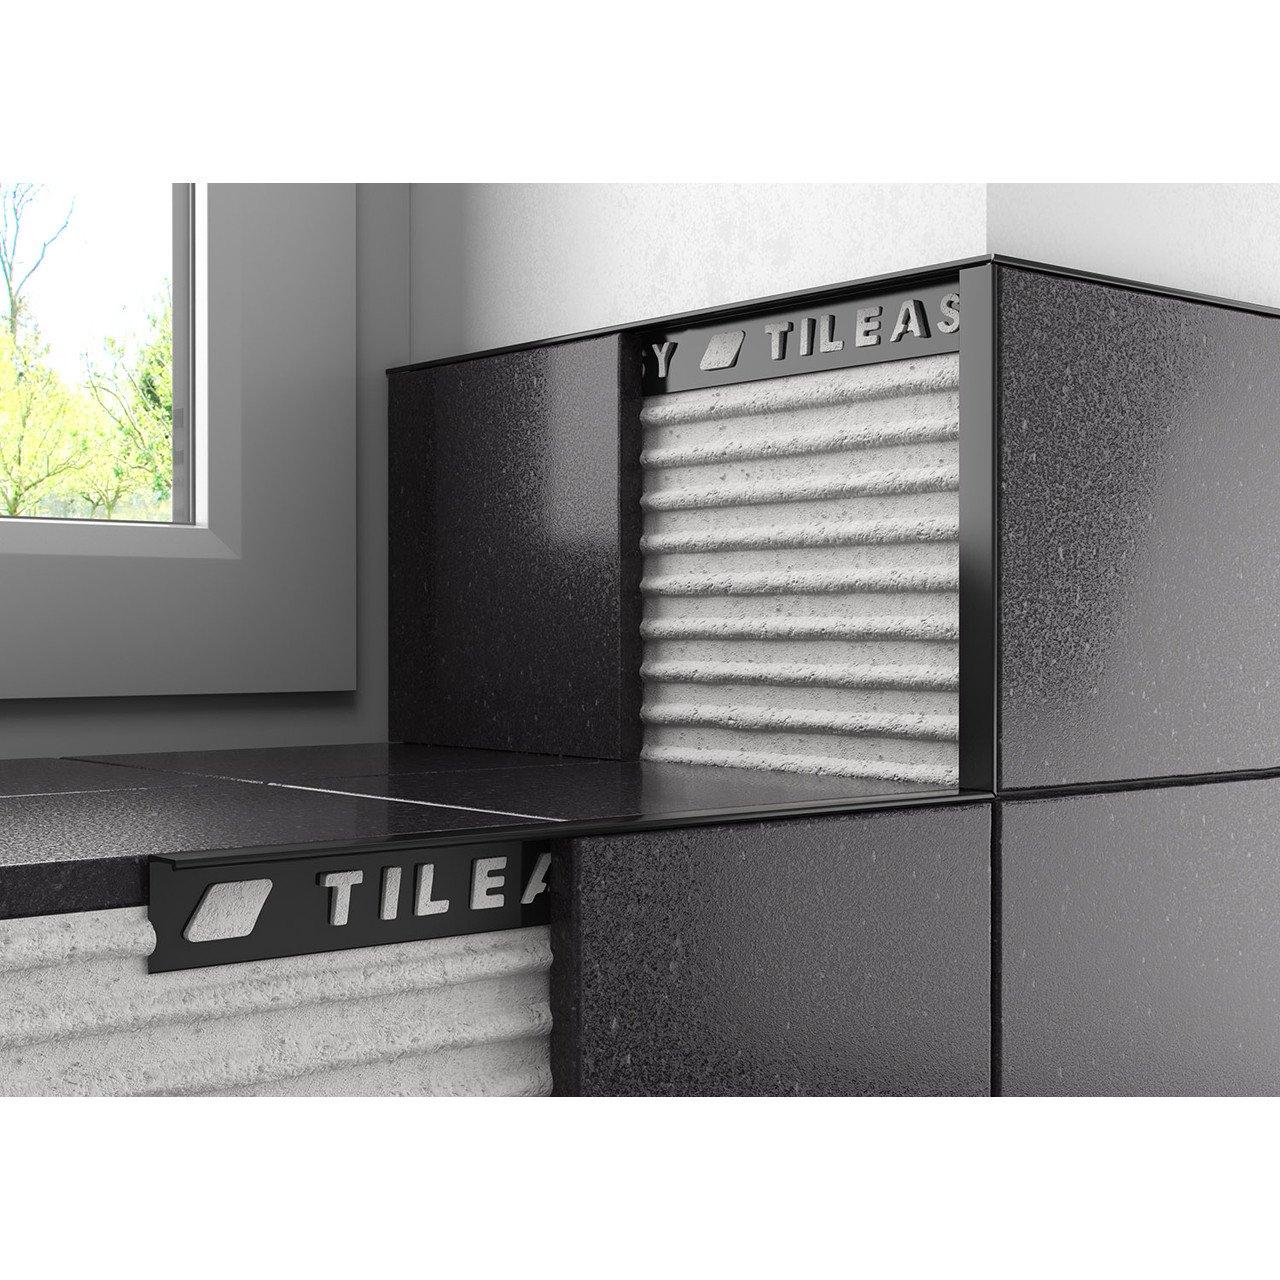 Tileasy 12mm Black Square Edge Metal Tile Trim Bat12 with regard to dimensions 1280 X 1280